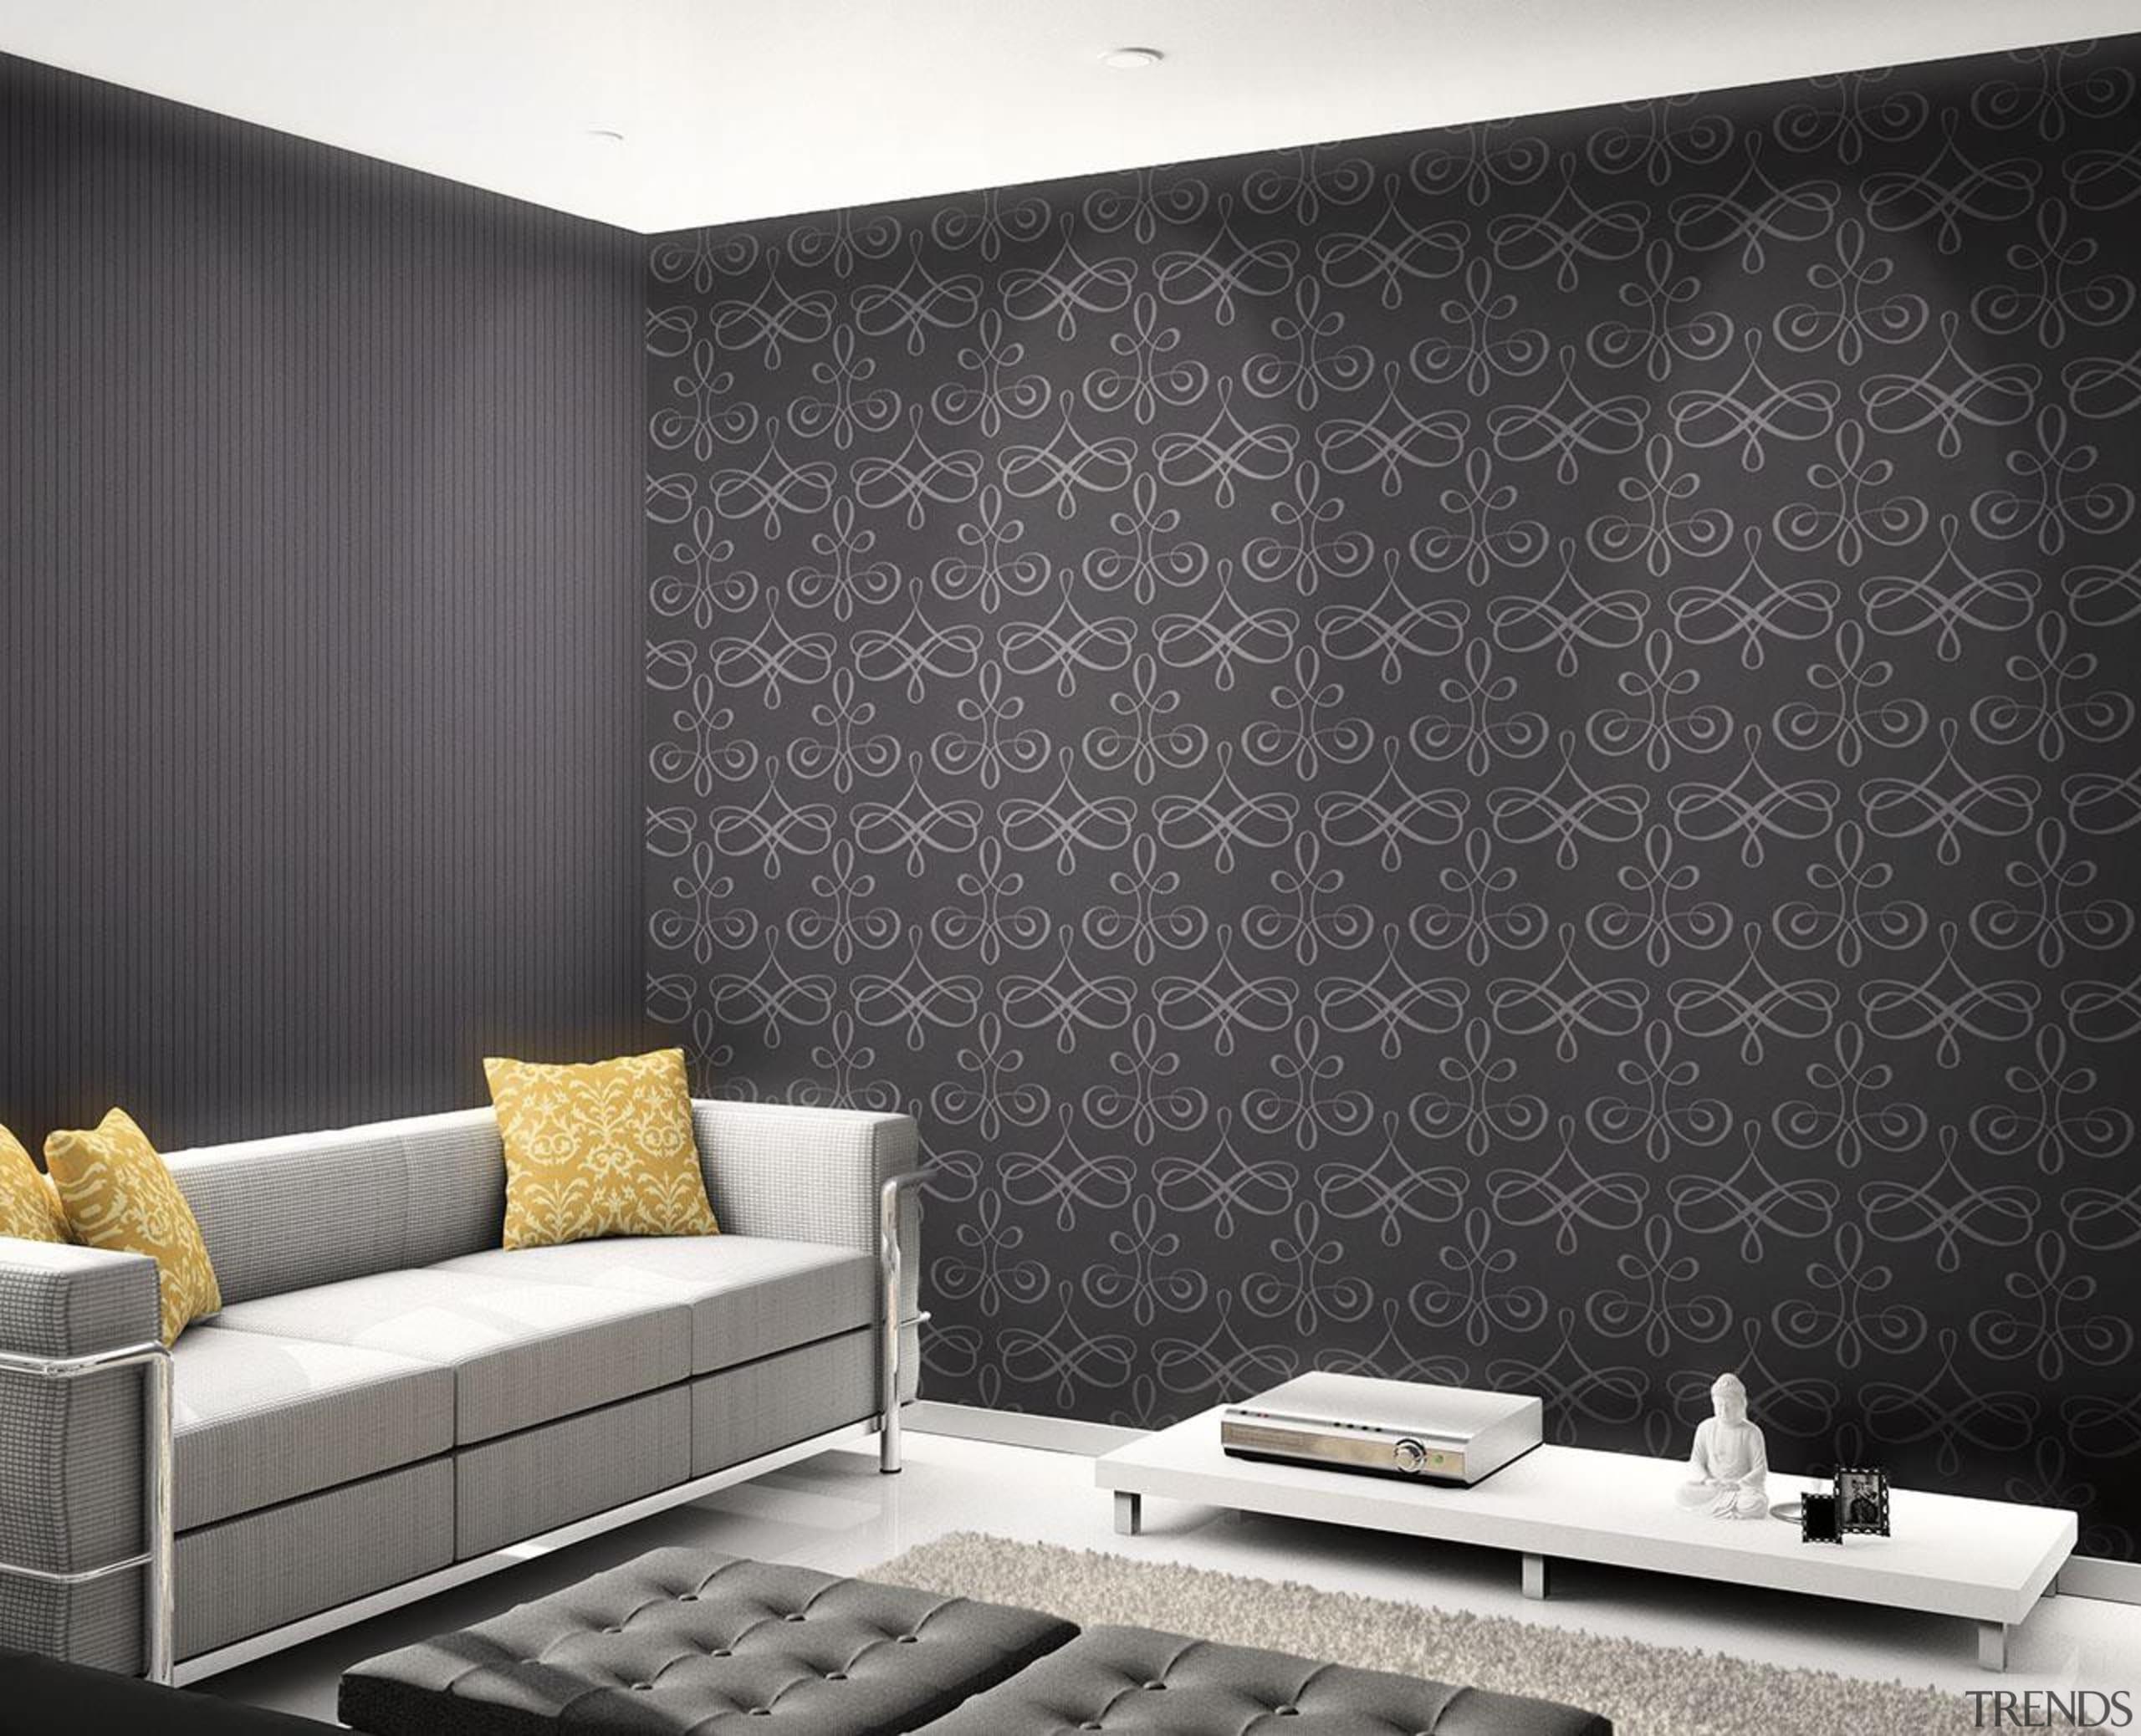 Aurora Range - Aurora Range - ceiling   ceiling, floor, interior design, living room, wall, wallpaper, window covering, black, gray